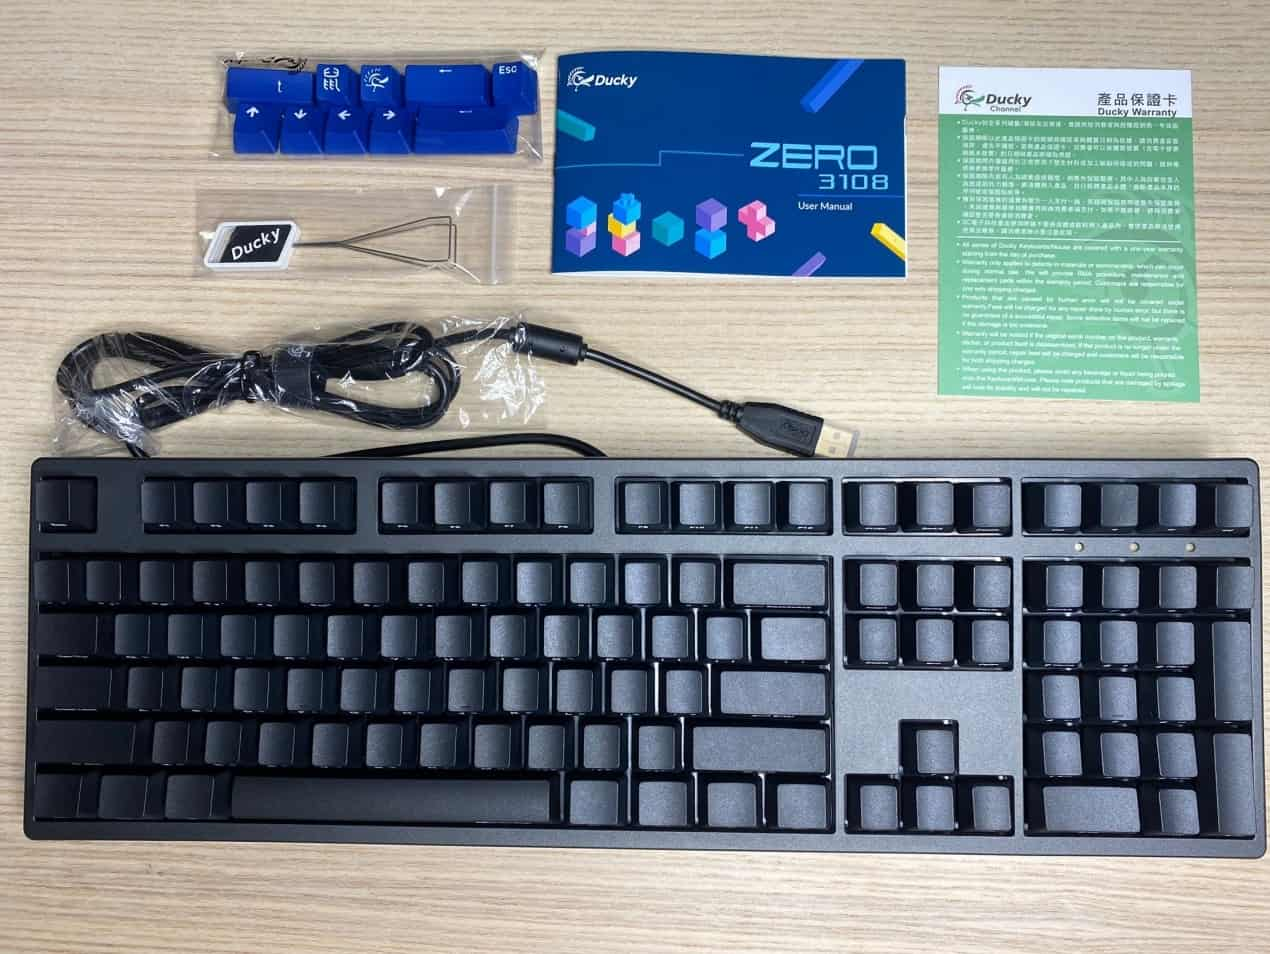 Zero-3108機械鍵盤-內部配件